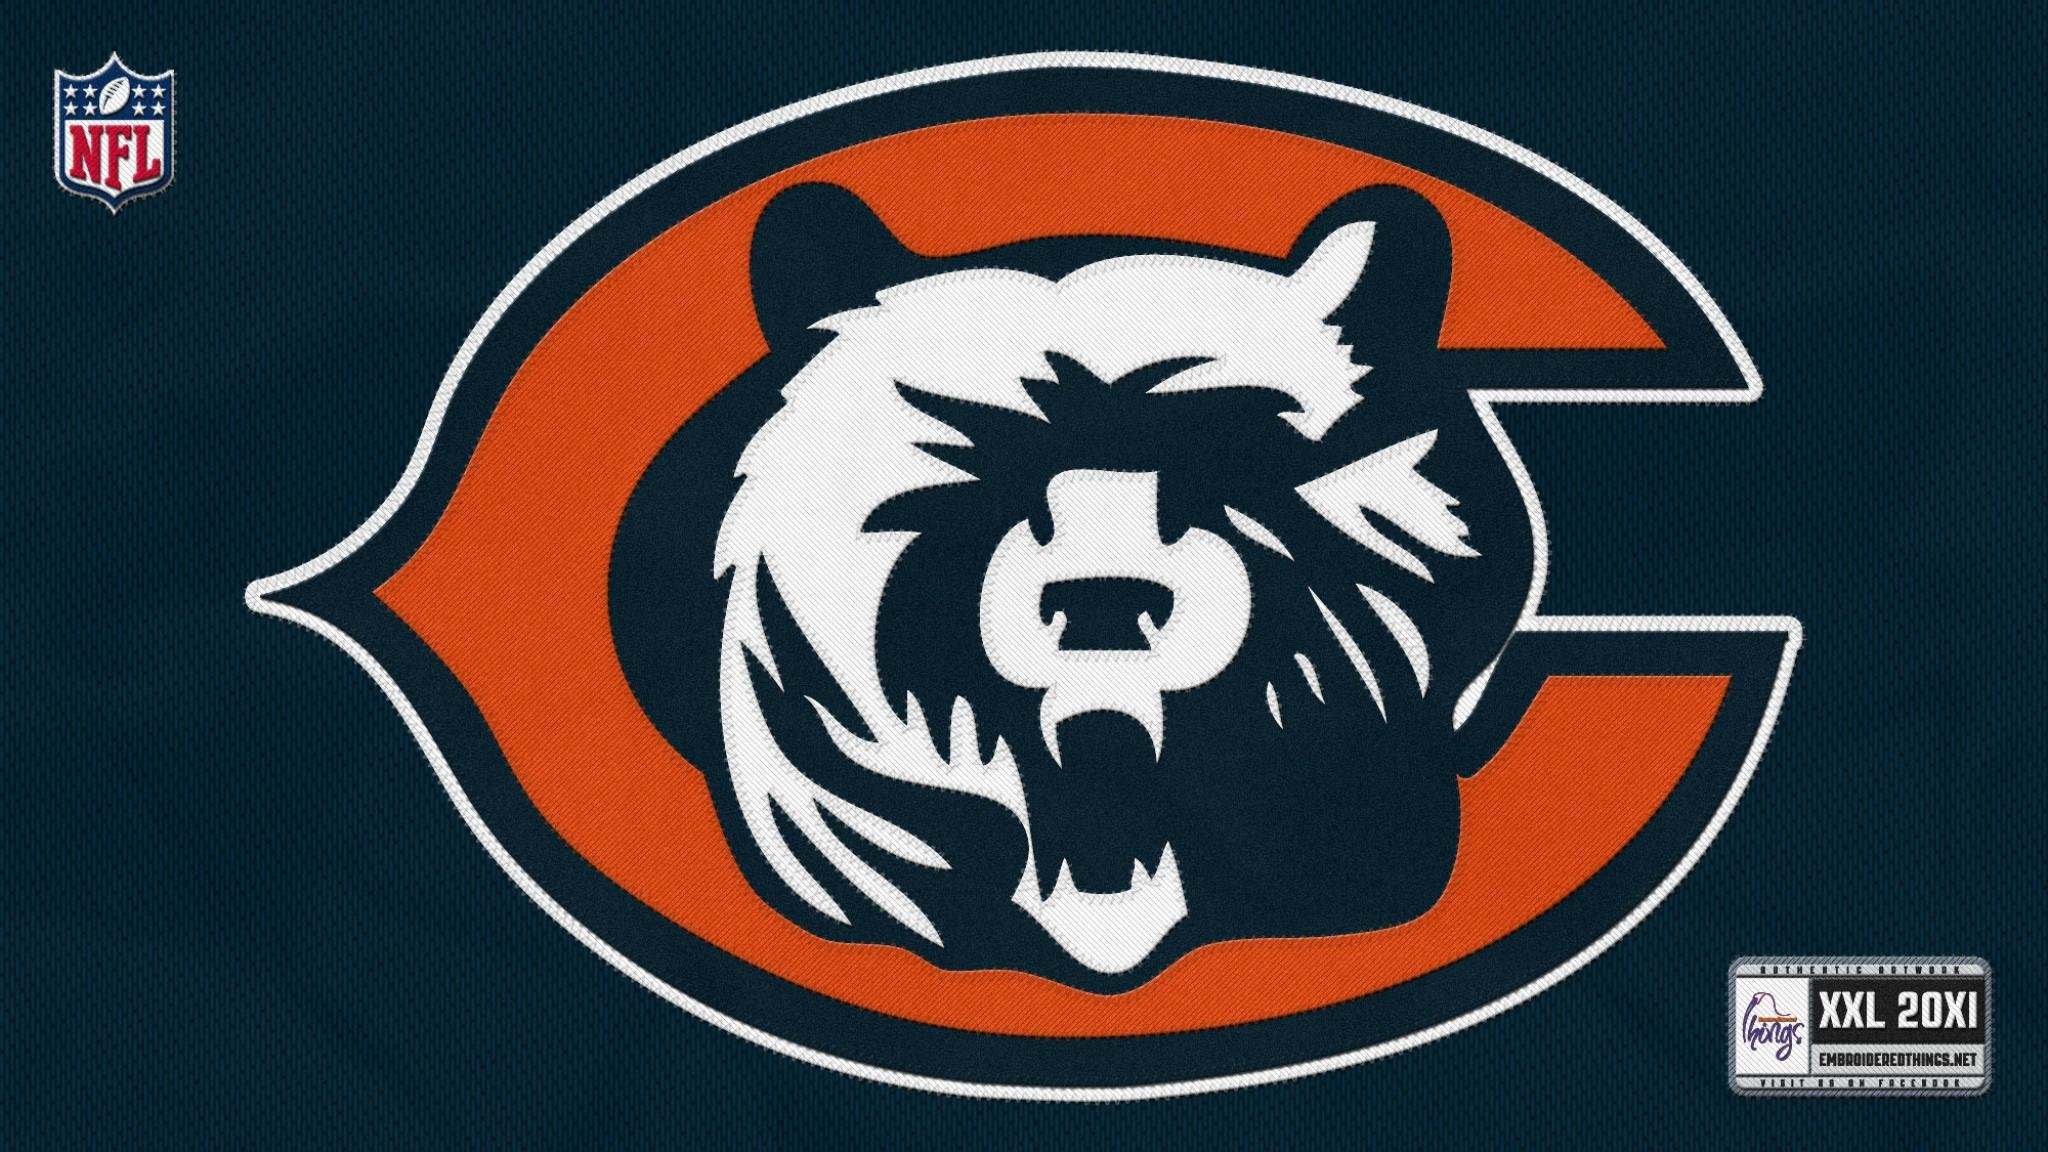 Chicago Bears wallpapers HD for desktop